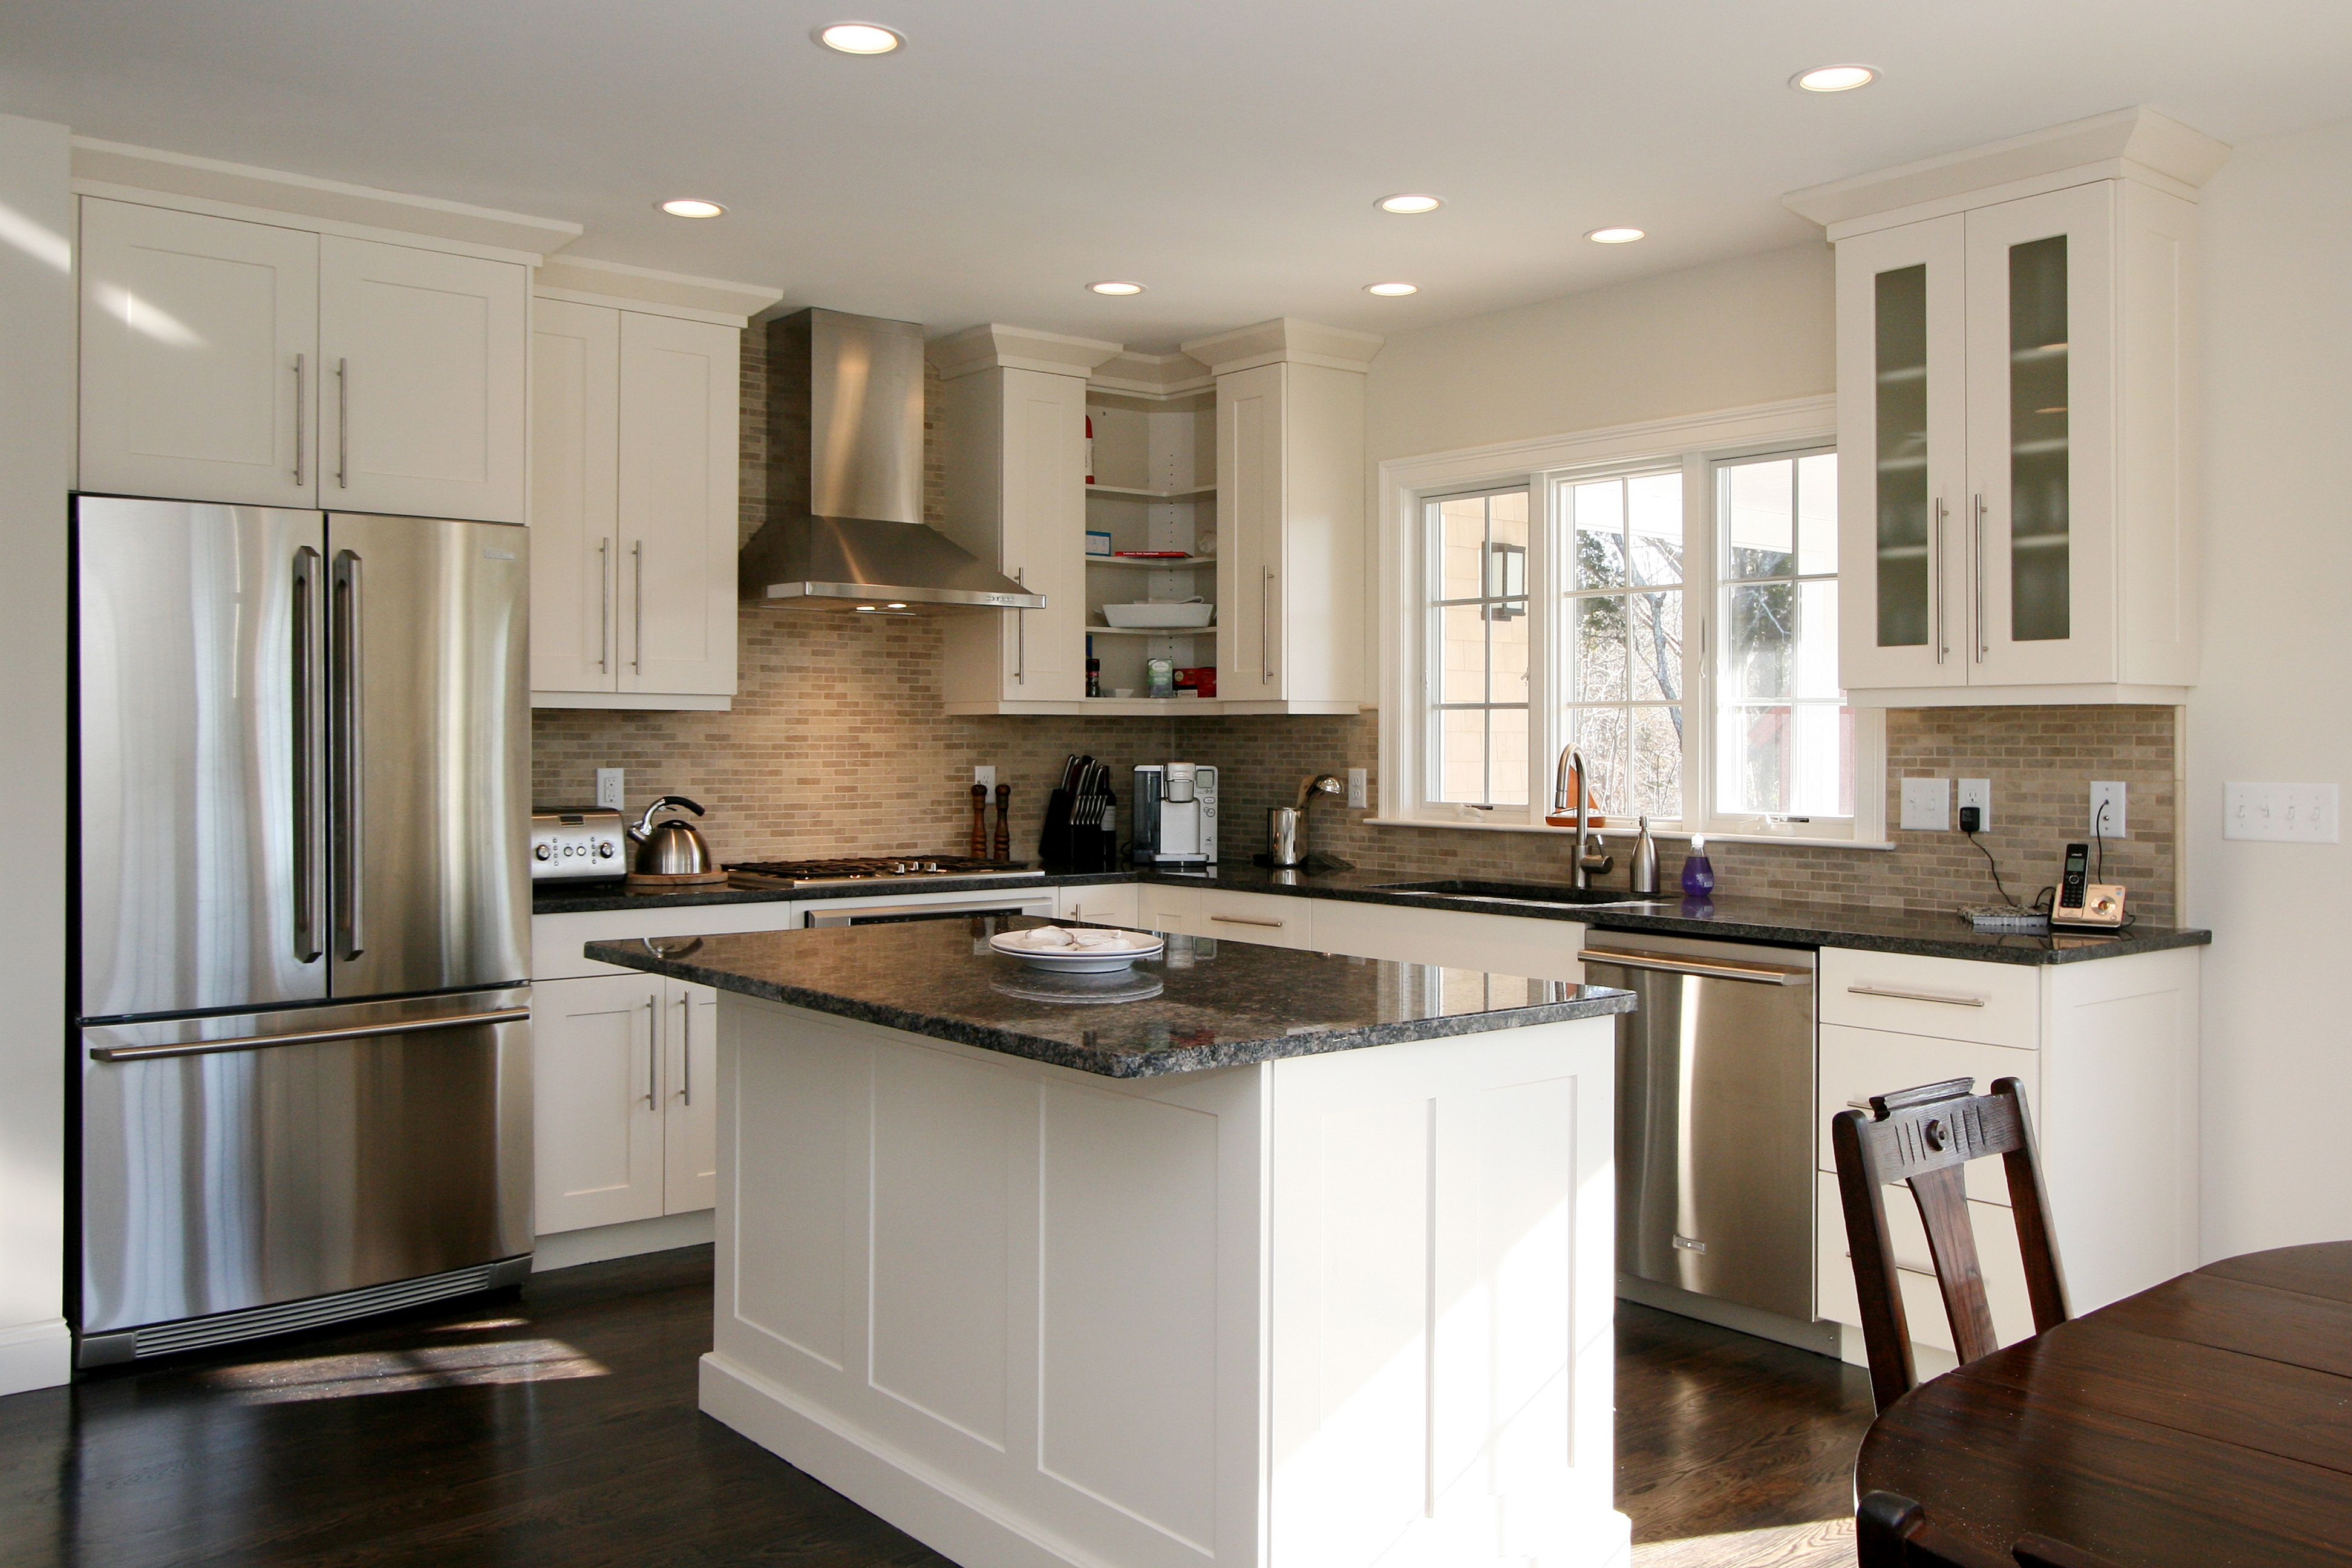 Island Kitchen Designs Layouts Image Result For Best Kitchen Layouts With Island  Kitchen Ideas